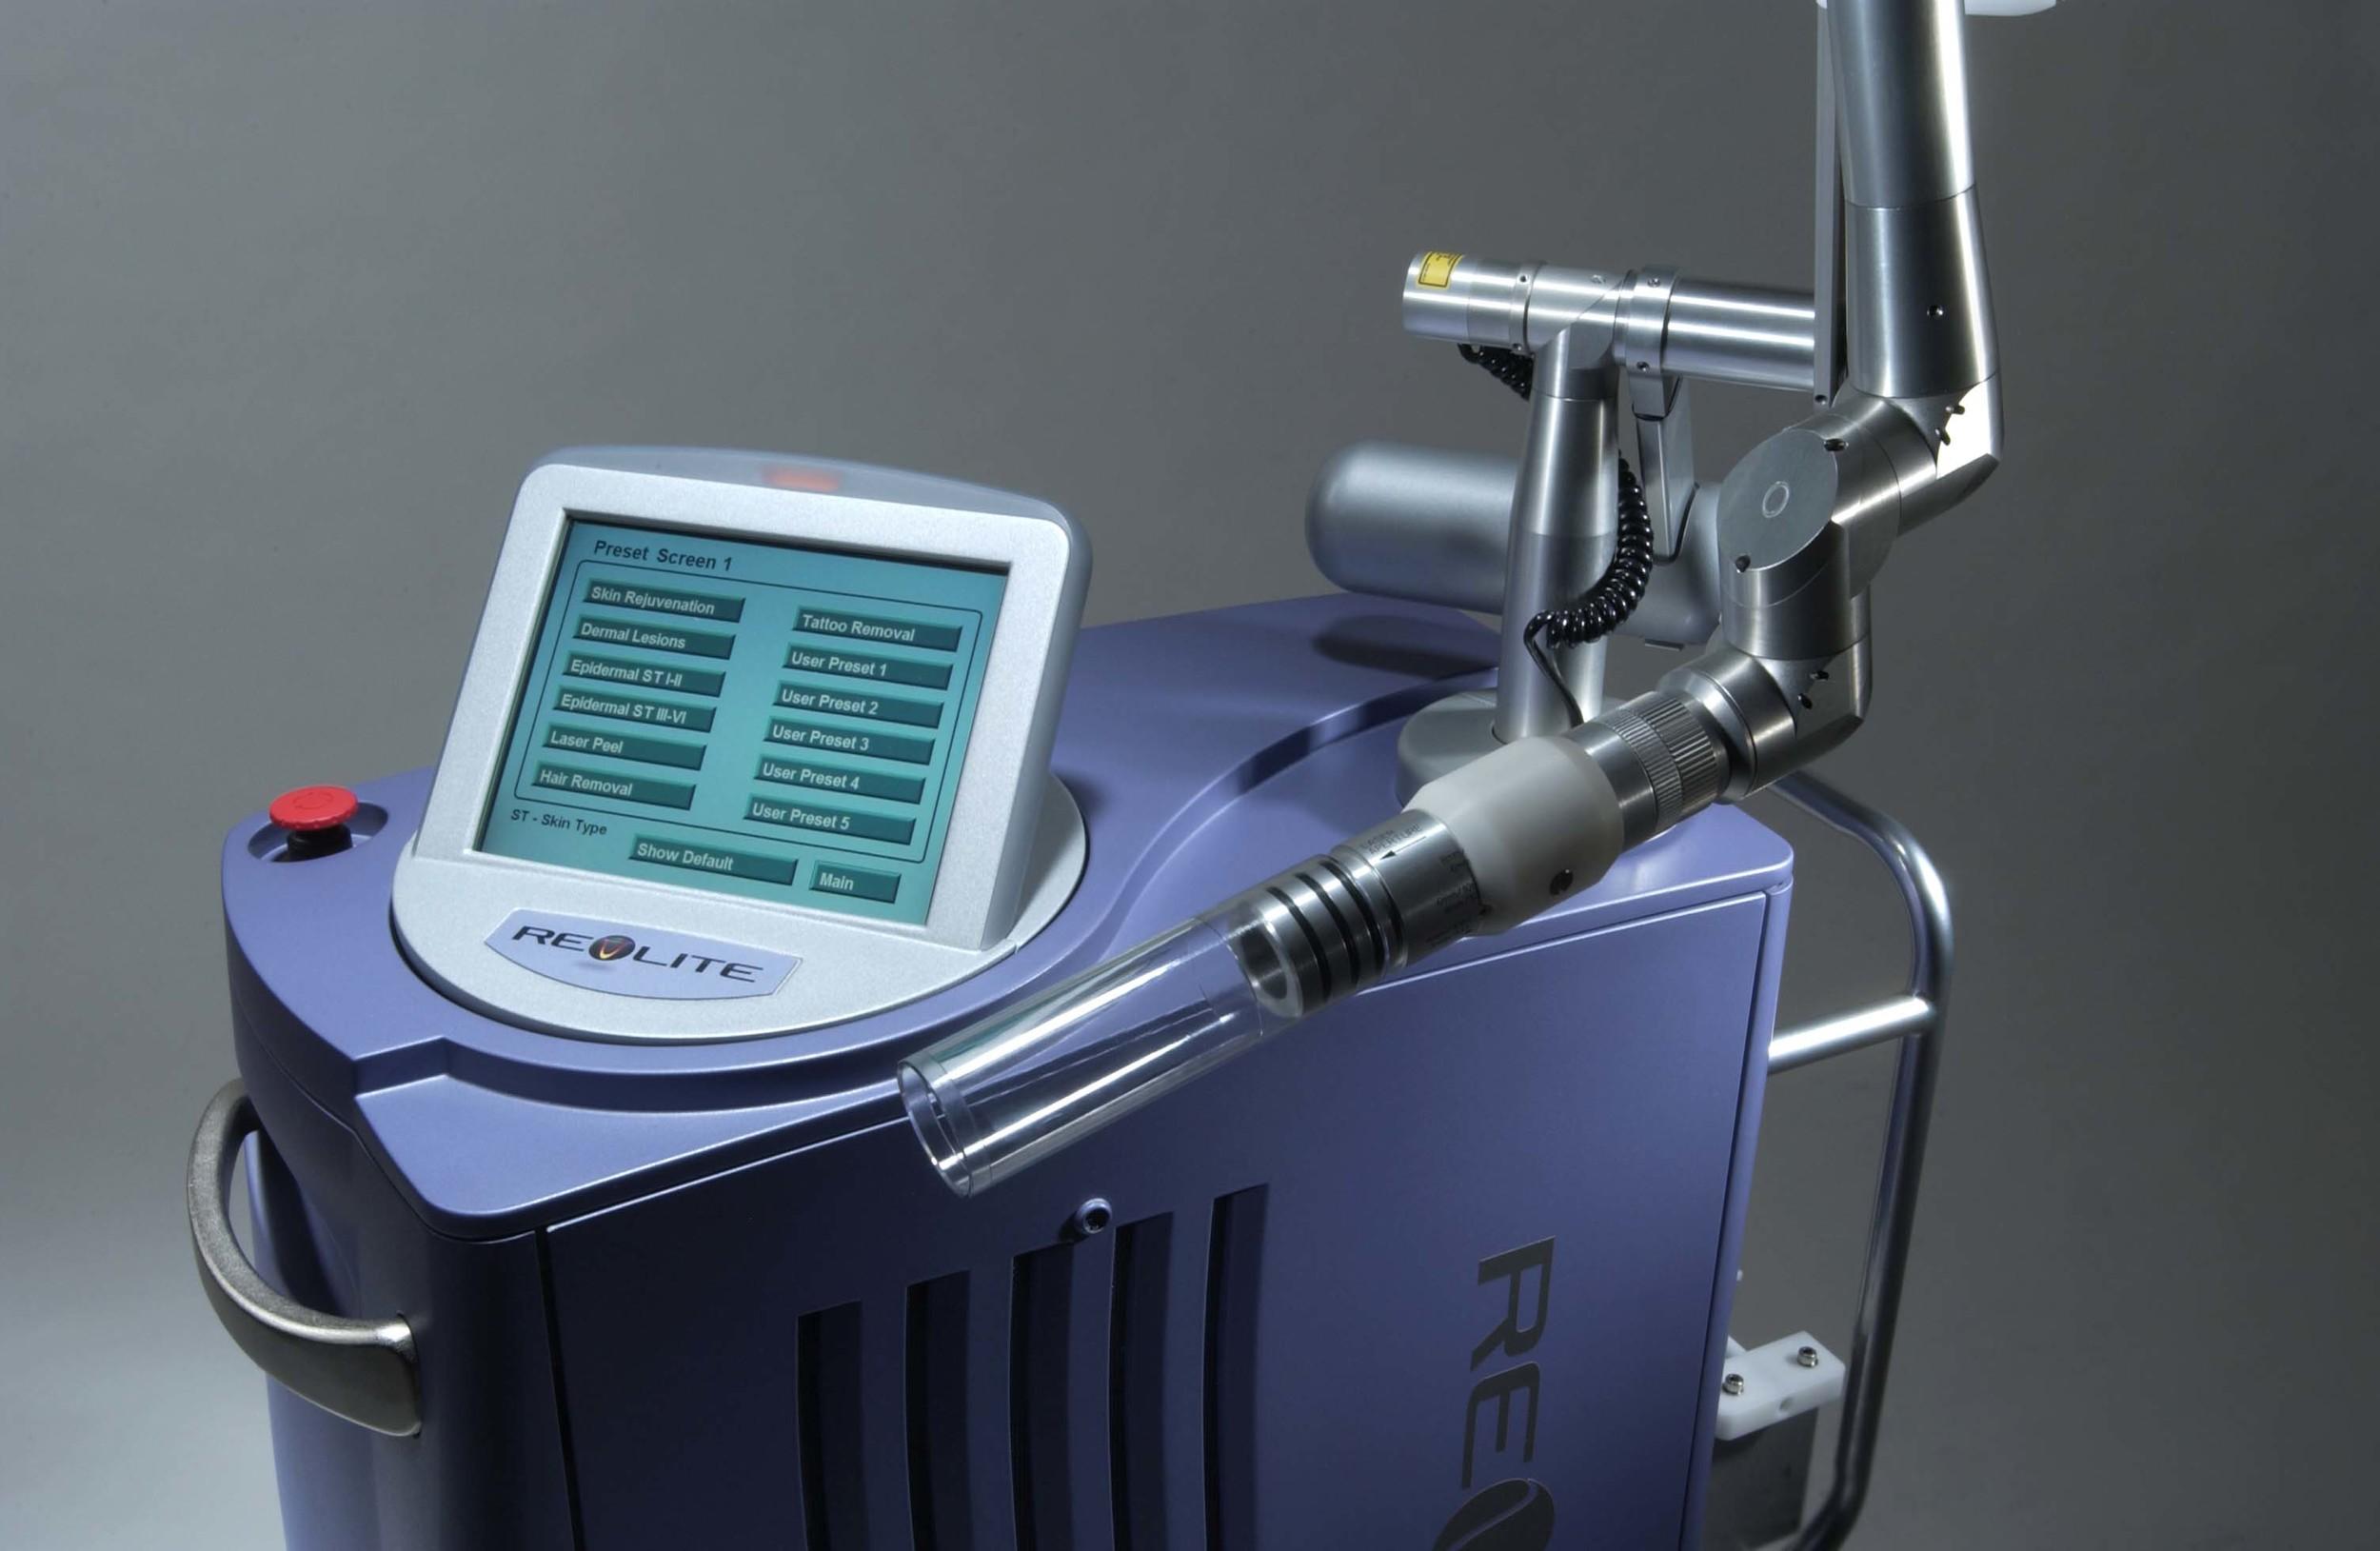 The RevLite SI Q-Switch Nd-YAG Laser